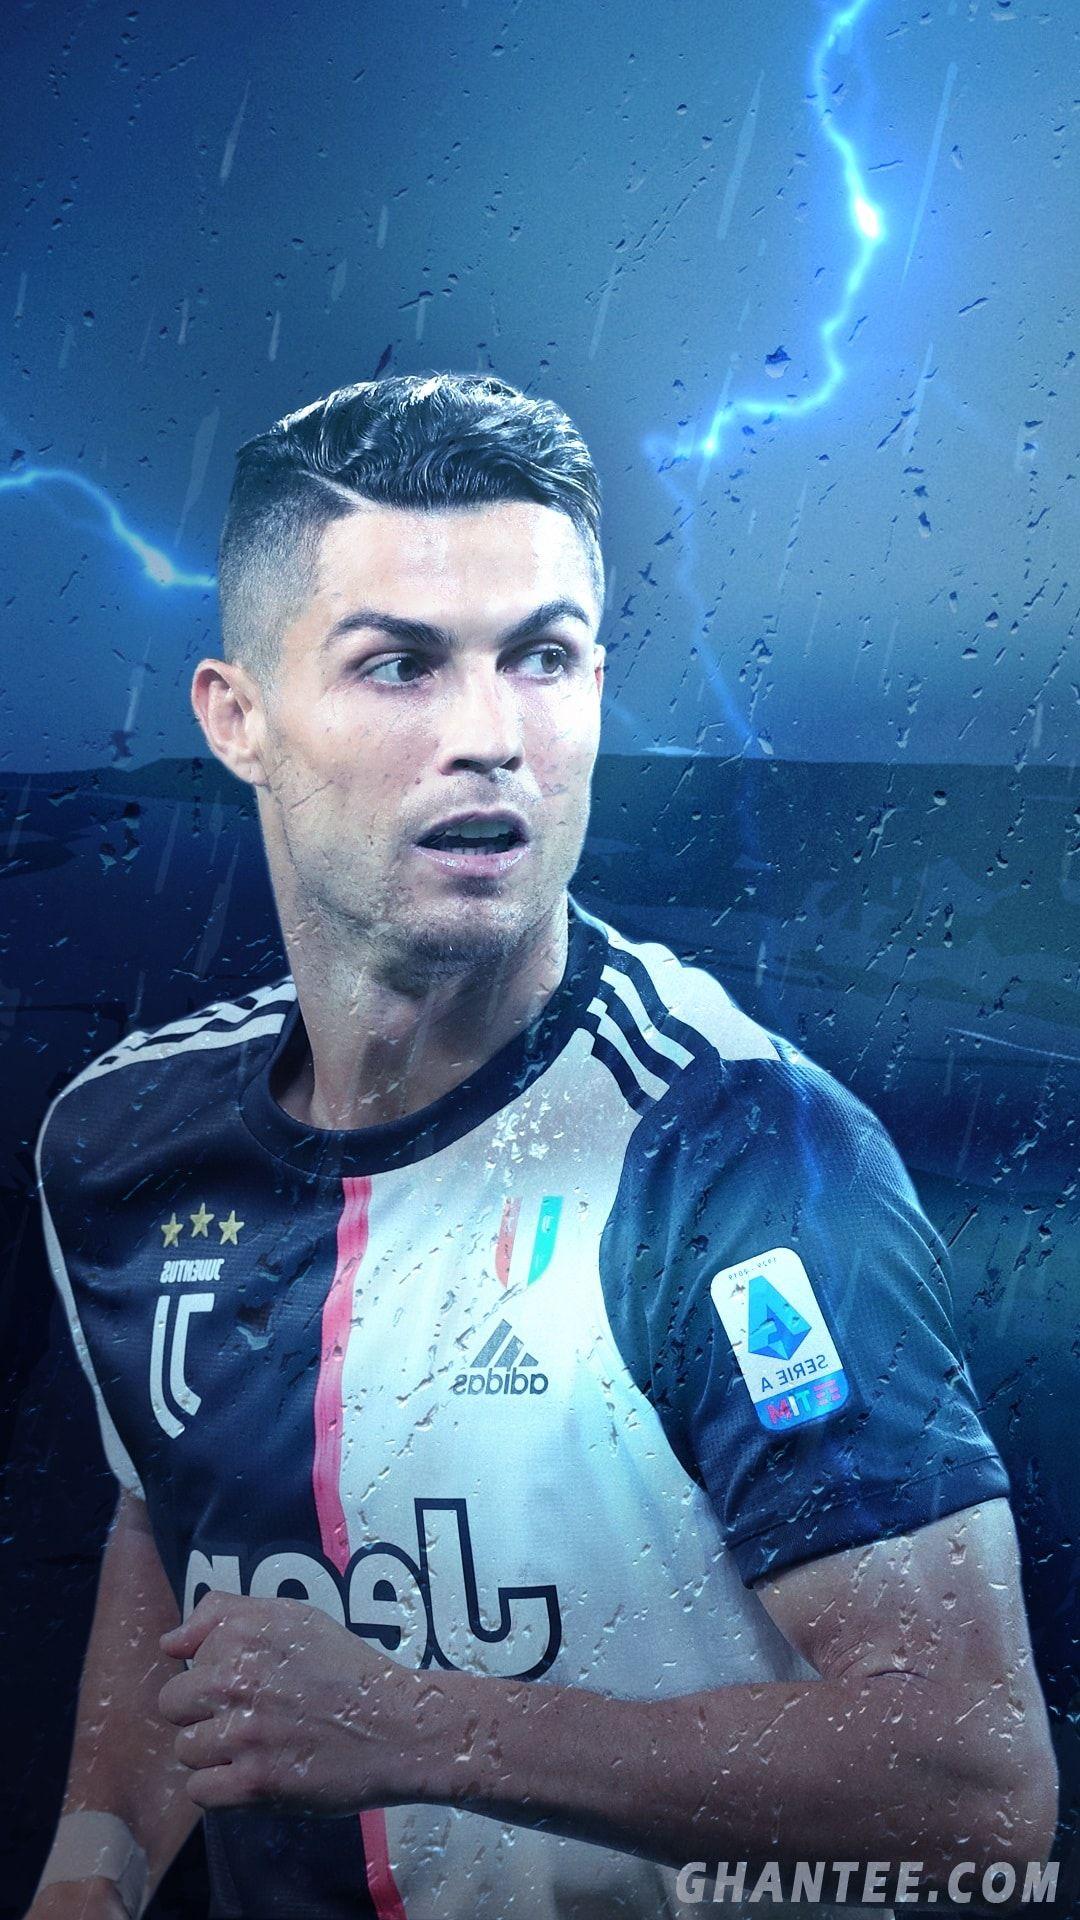 Ronaldo Hd Phone Wallpaper Cristiano Ronaldo Hd Wallpapers Cristiano Ronaldo Cristiano Ronaldo Juventus Cristiano ronaldo hd wallpaper juventus